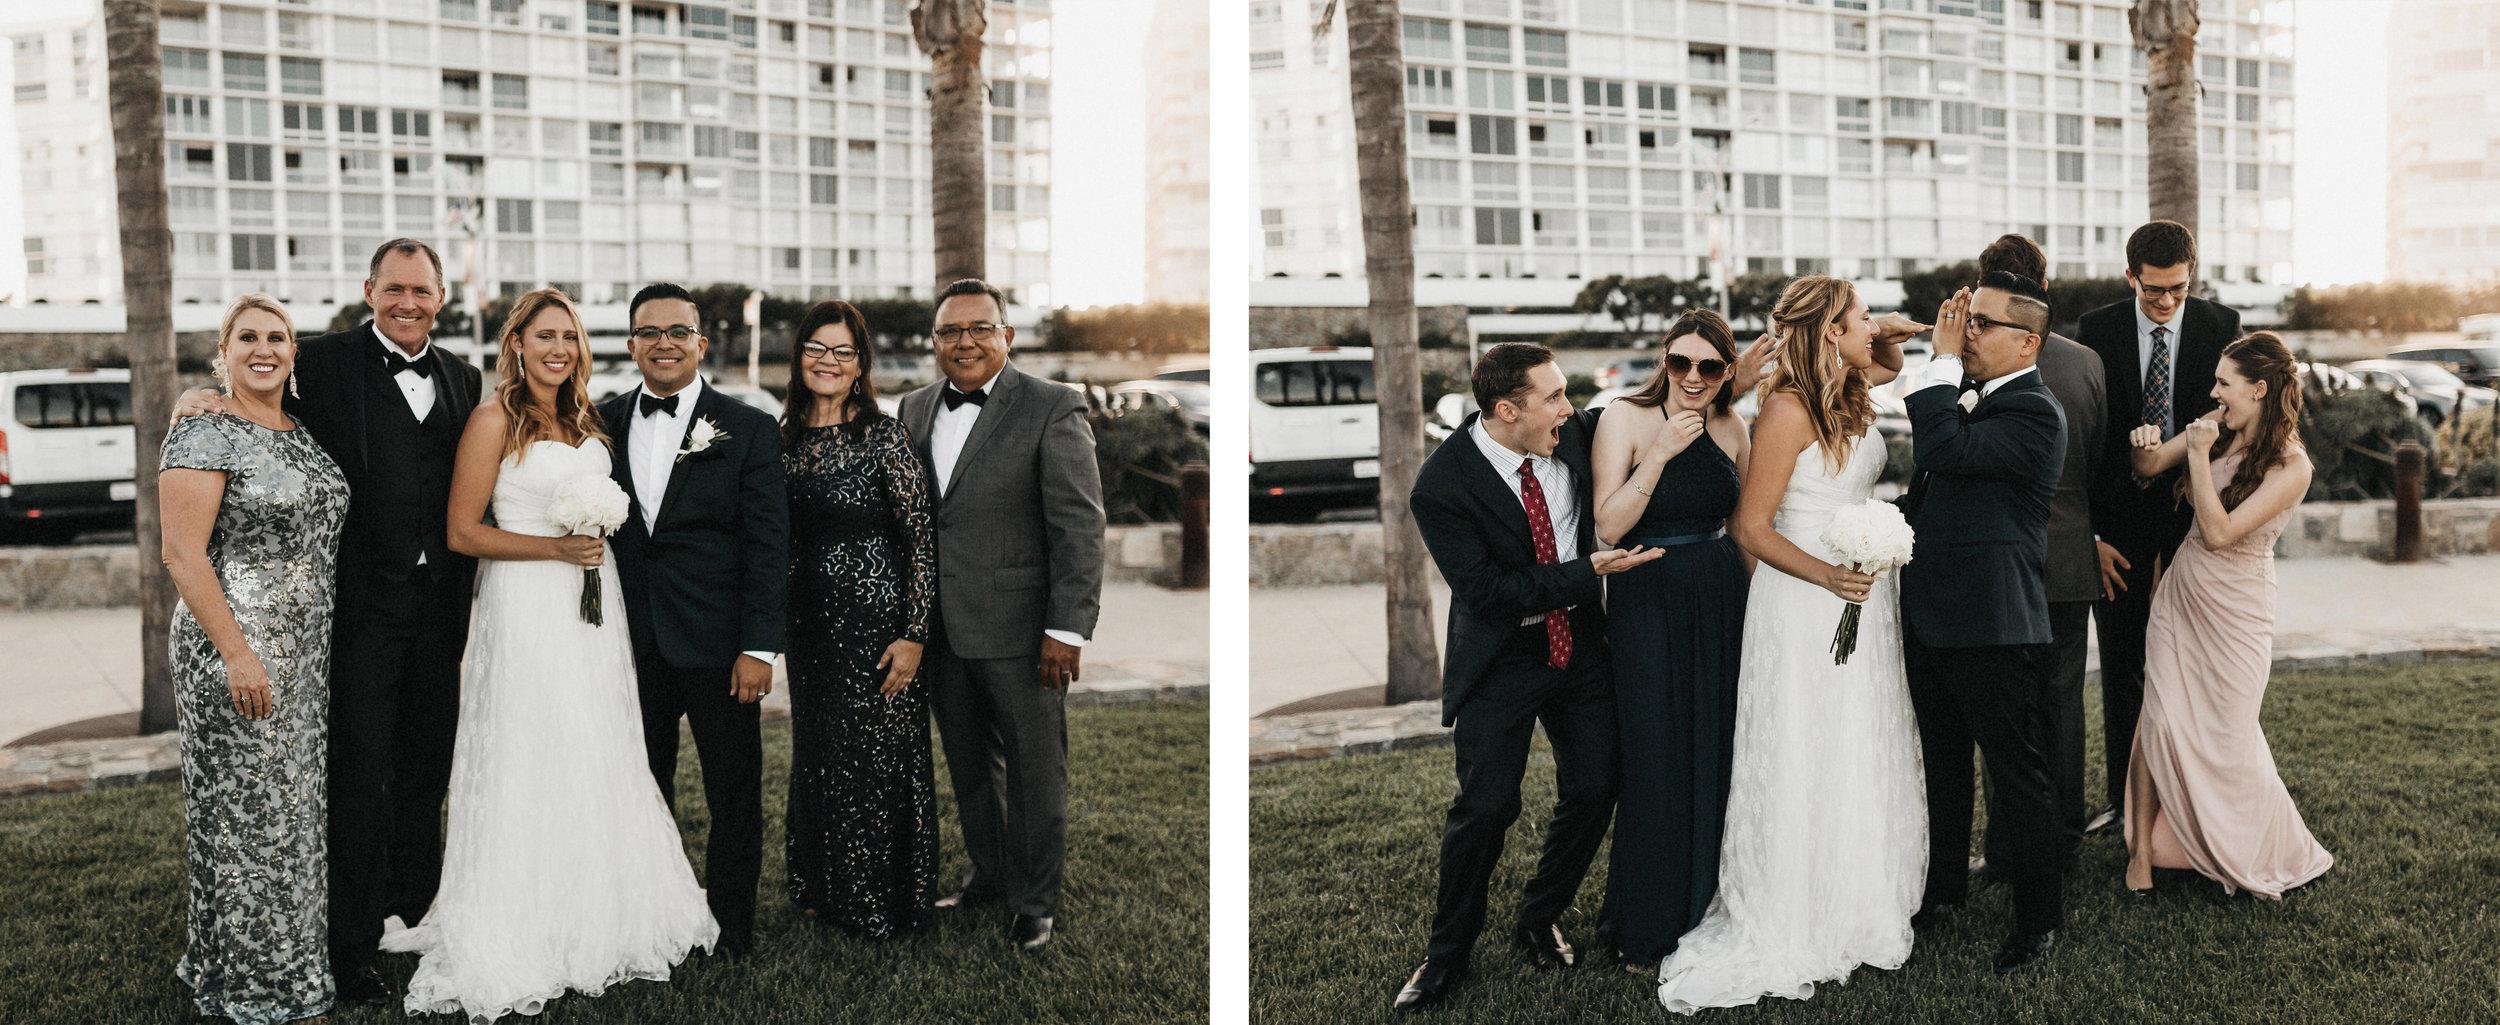 coronado wedding_10.jpg